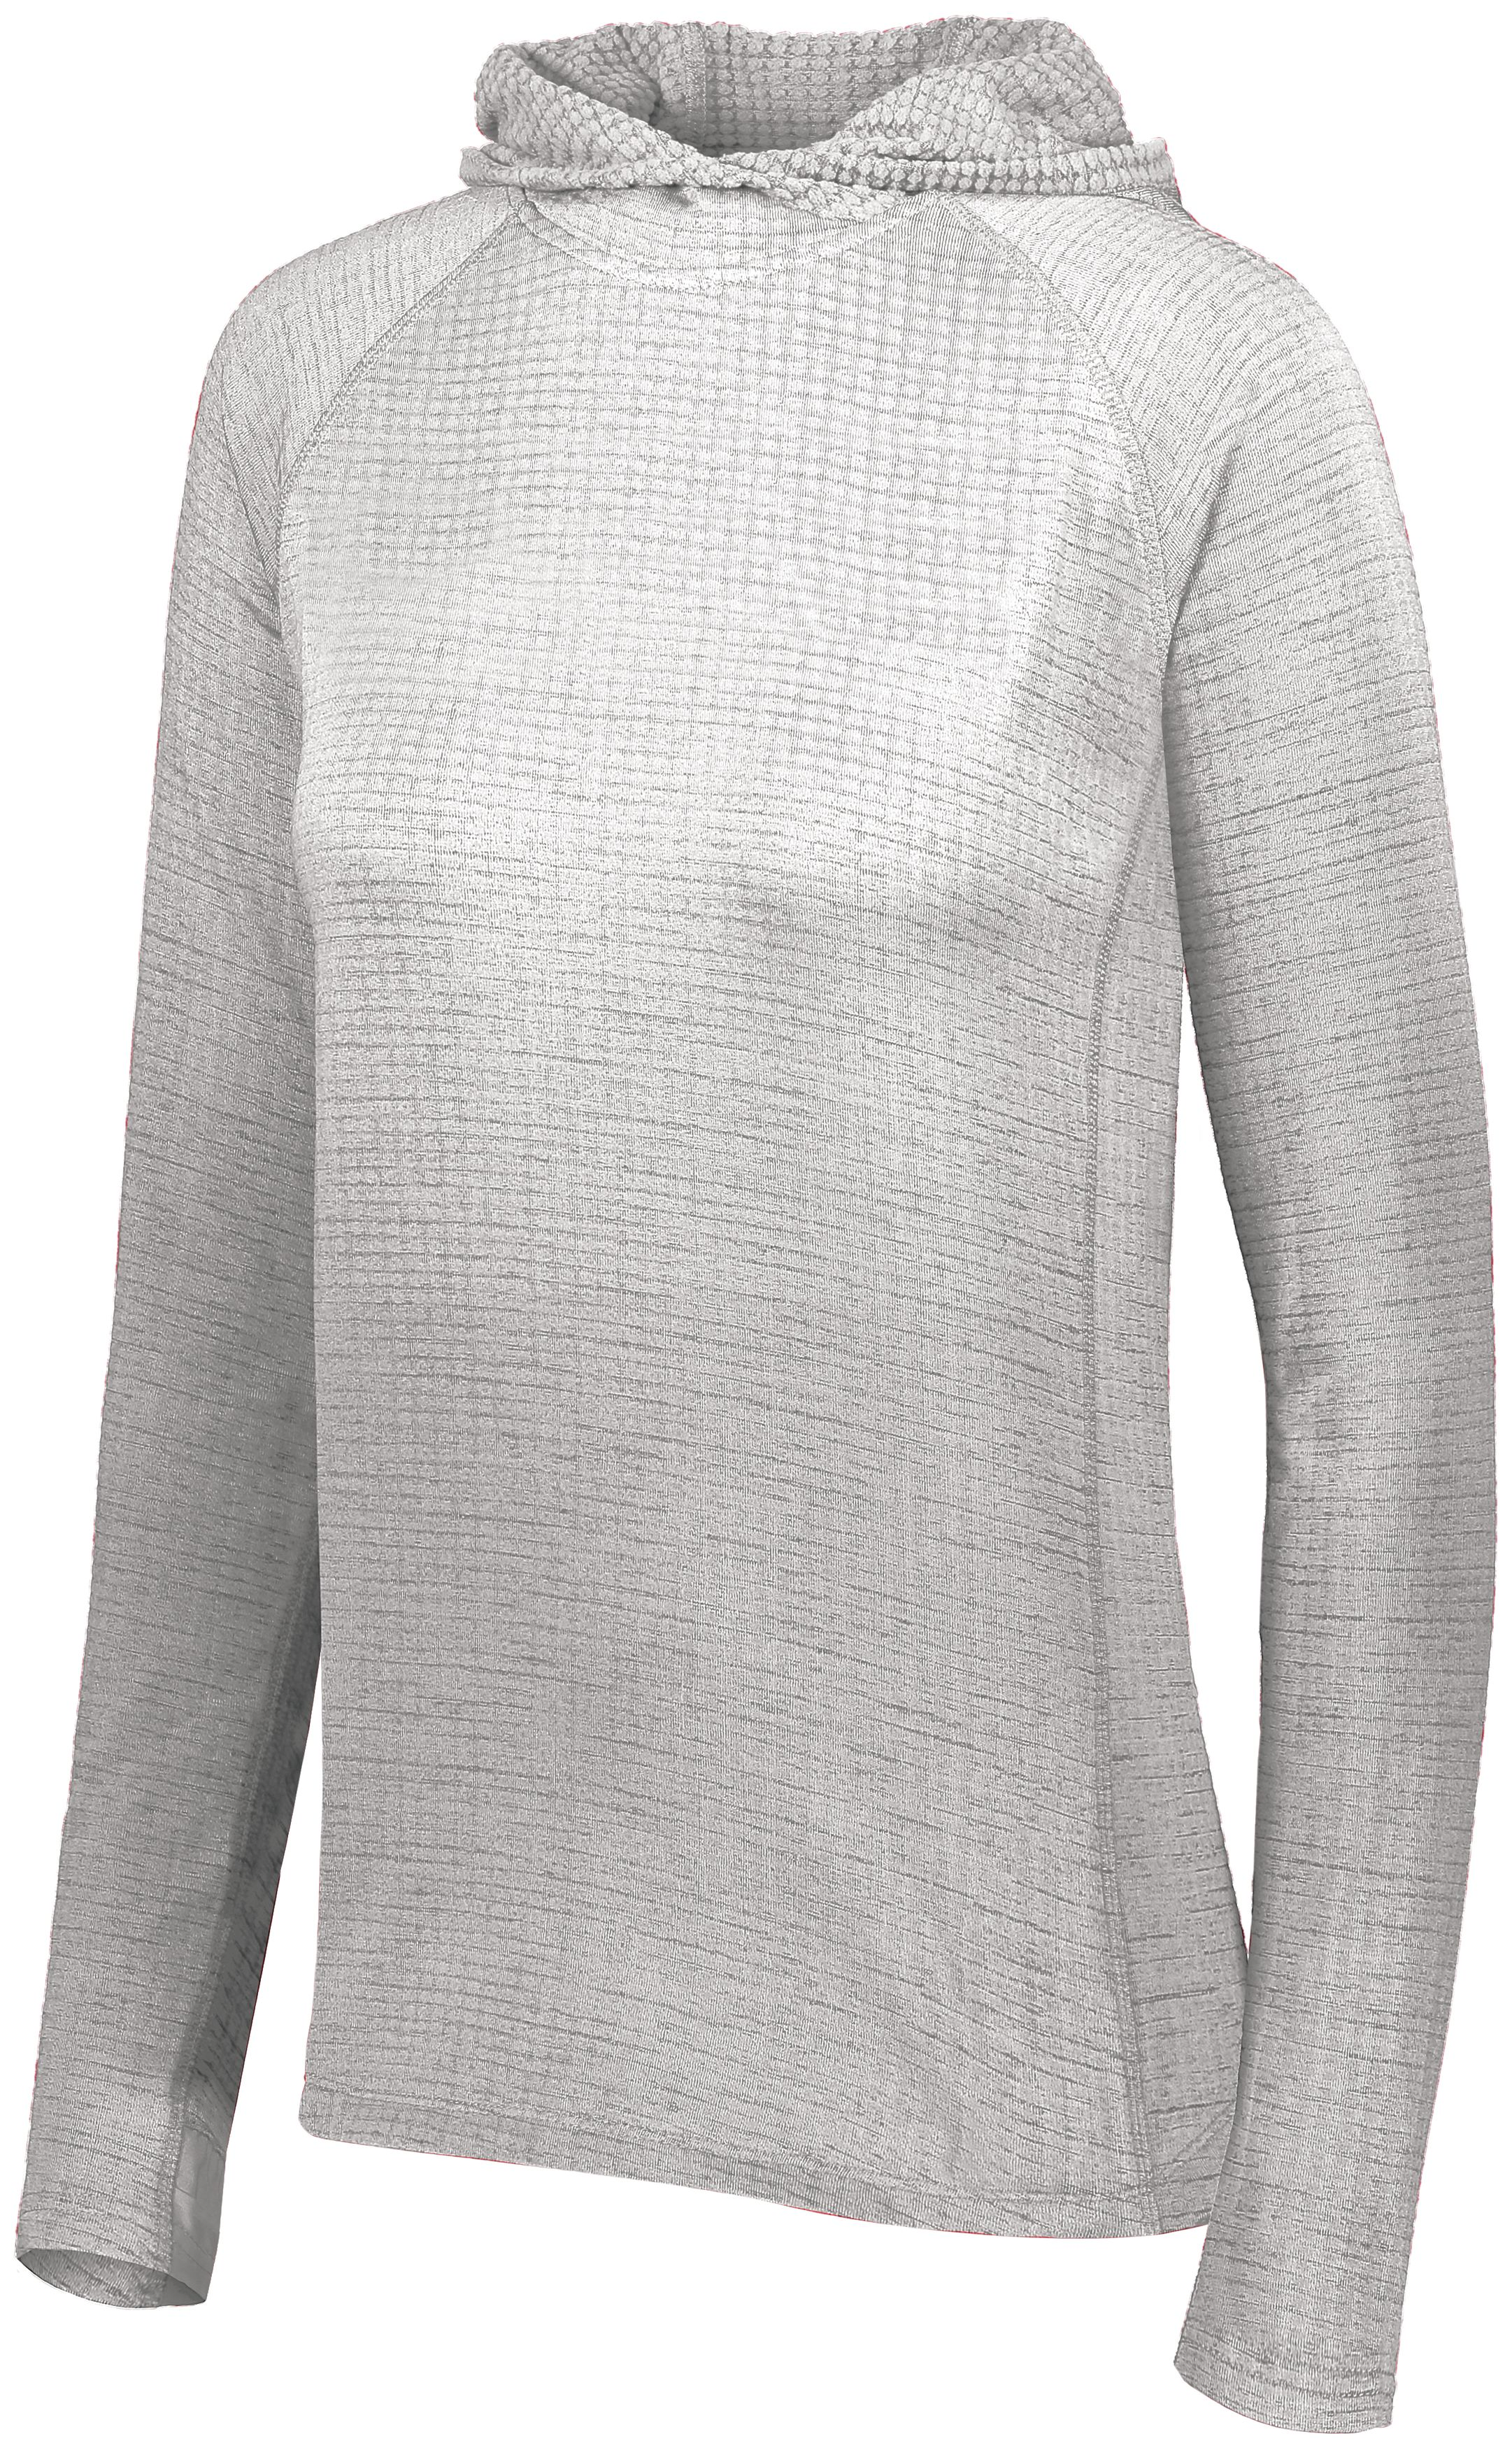 Ladies 3D Regulate Lightweight Pullover - WHITE HEATHER